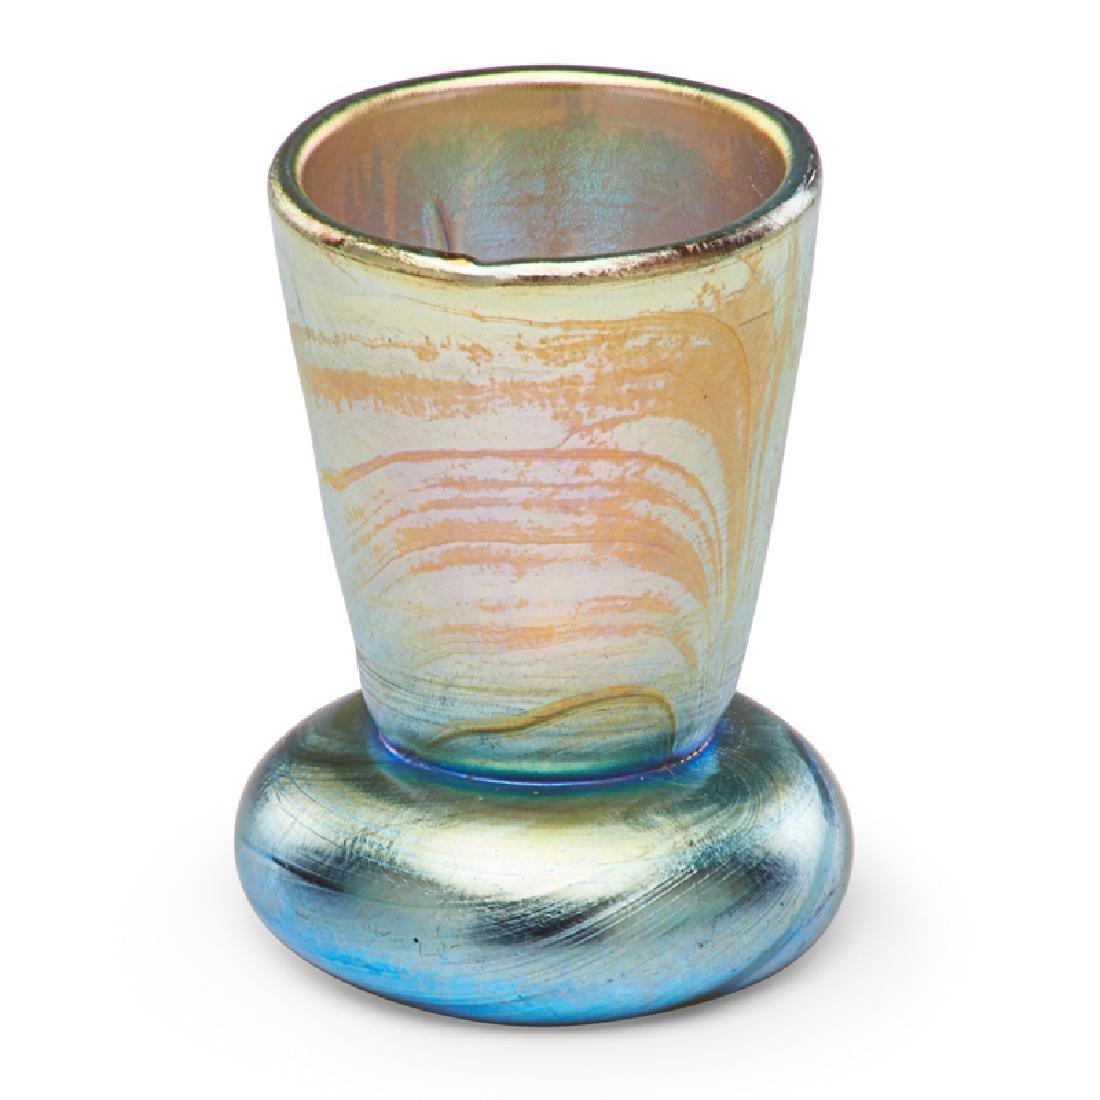 TIFFANY STUDIOS Miniature Favrile vase - 3